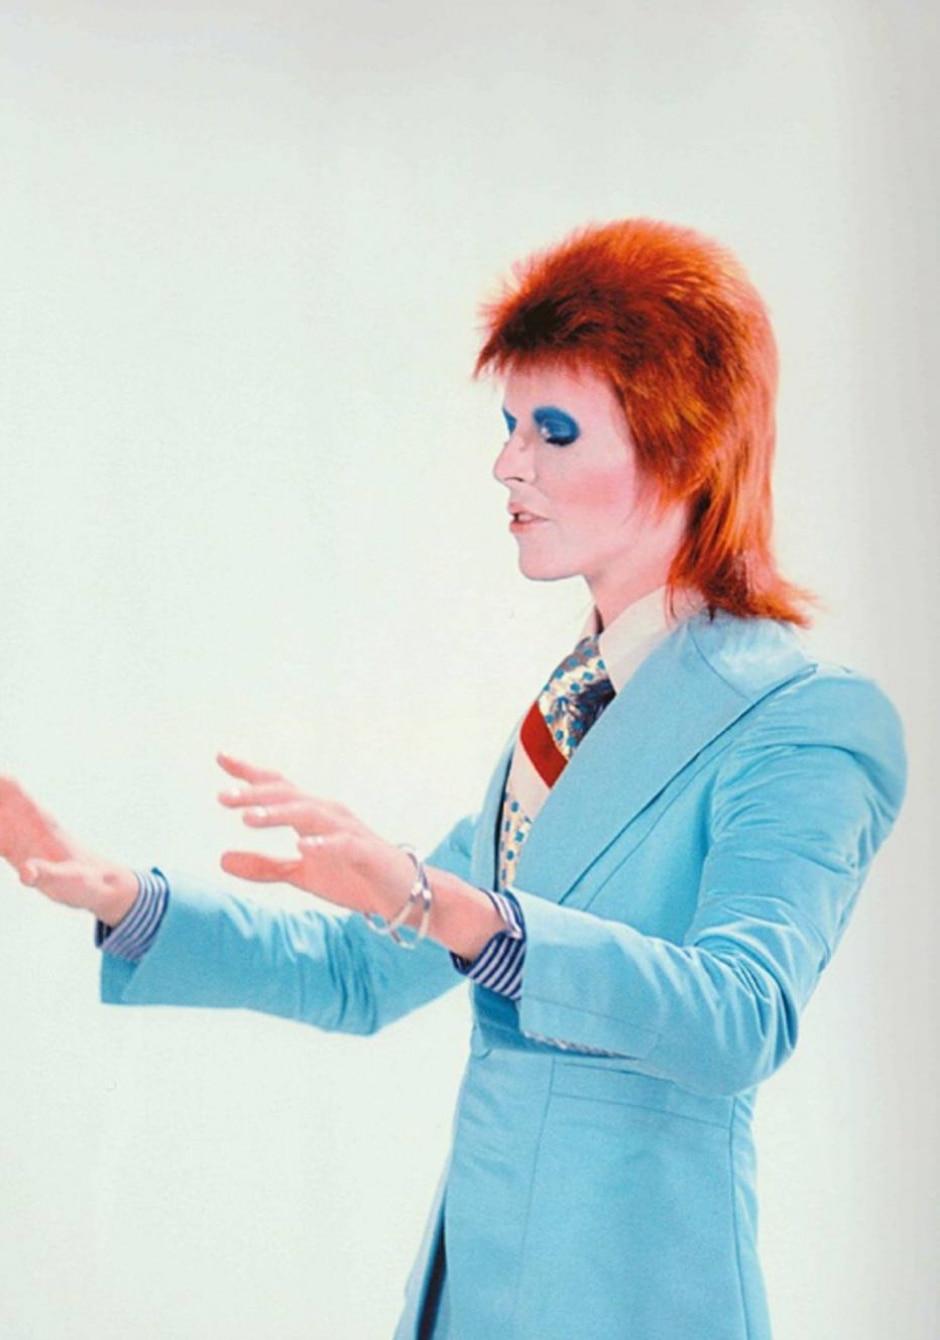 Reprodução/ Bowie Pills Tumblr